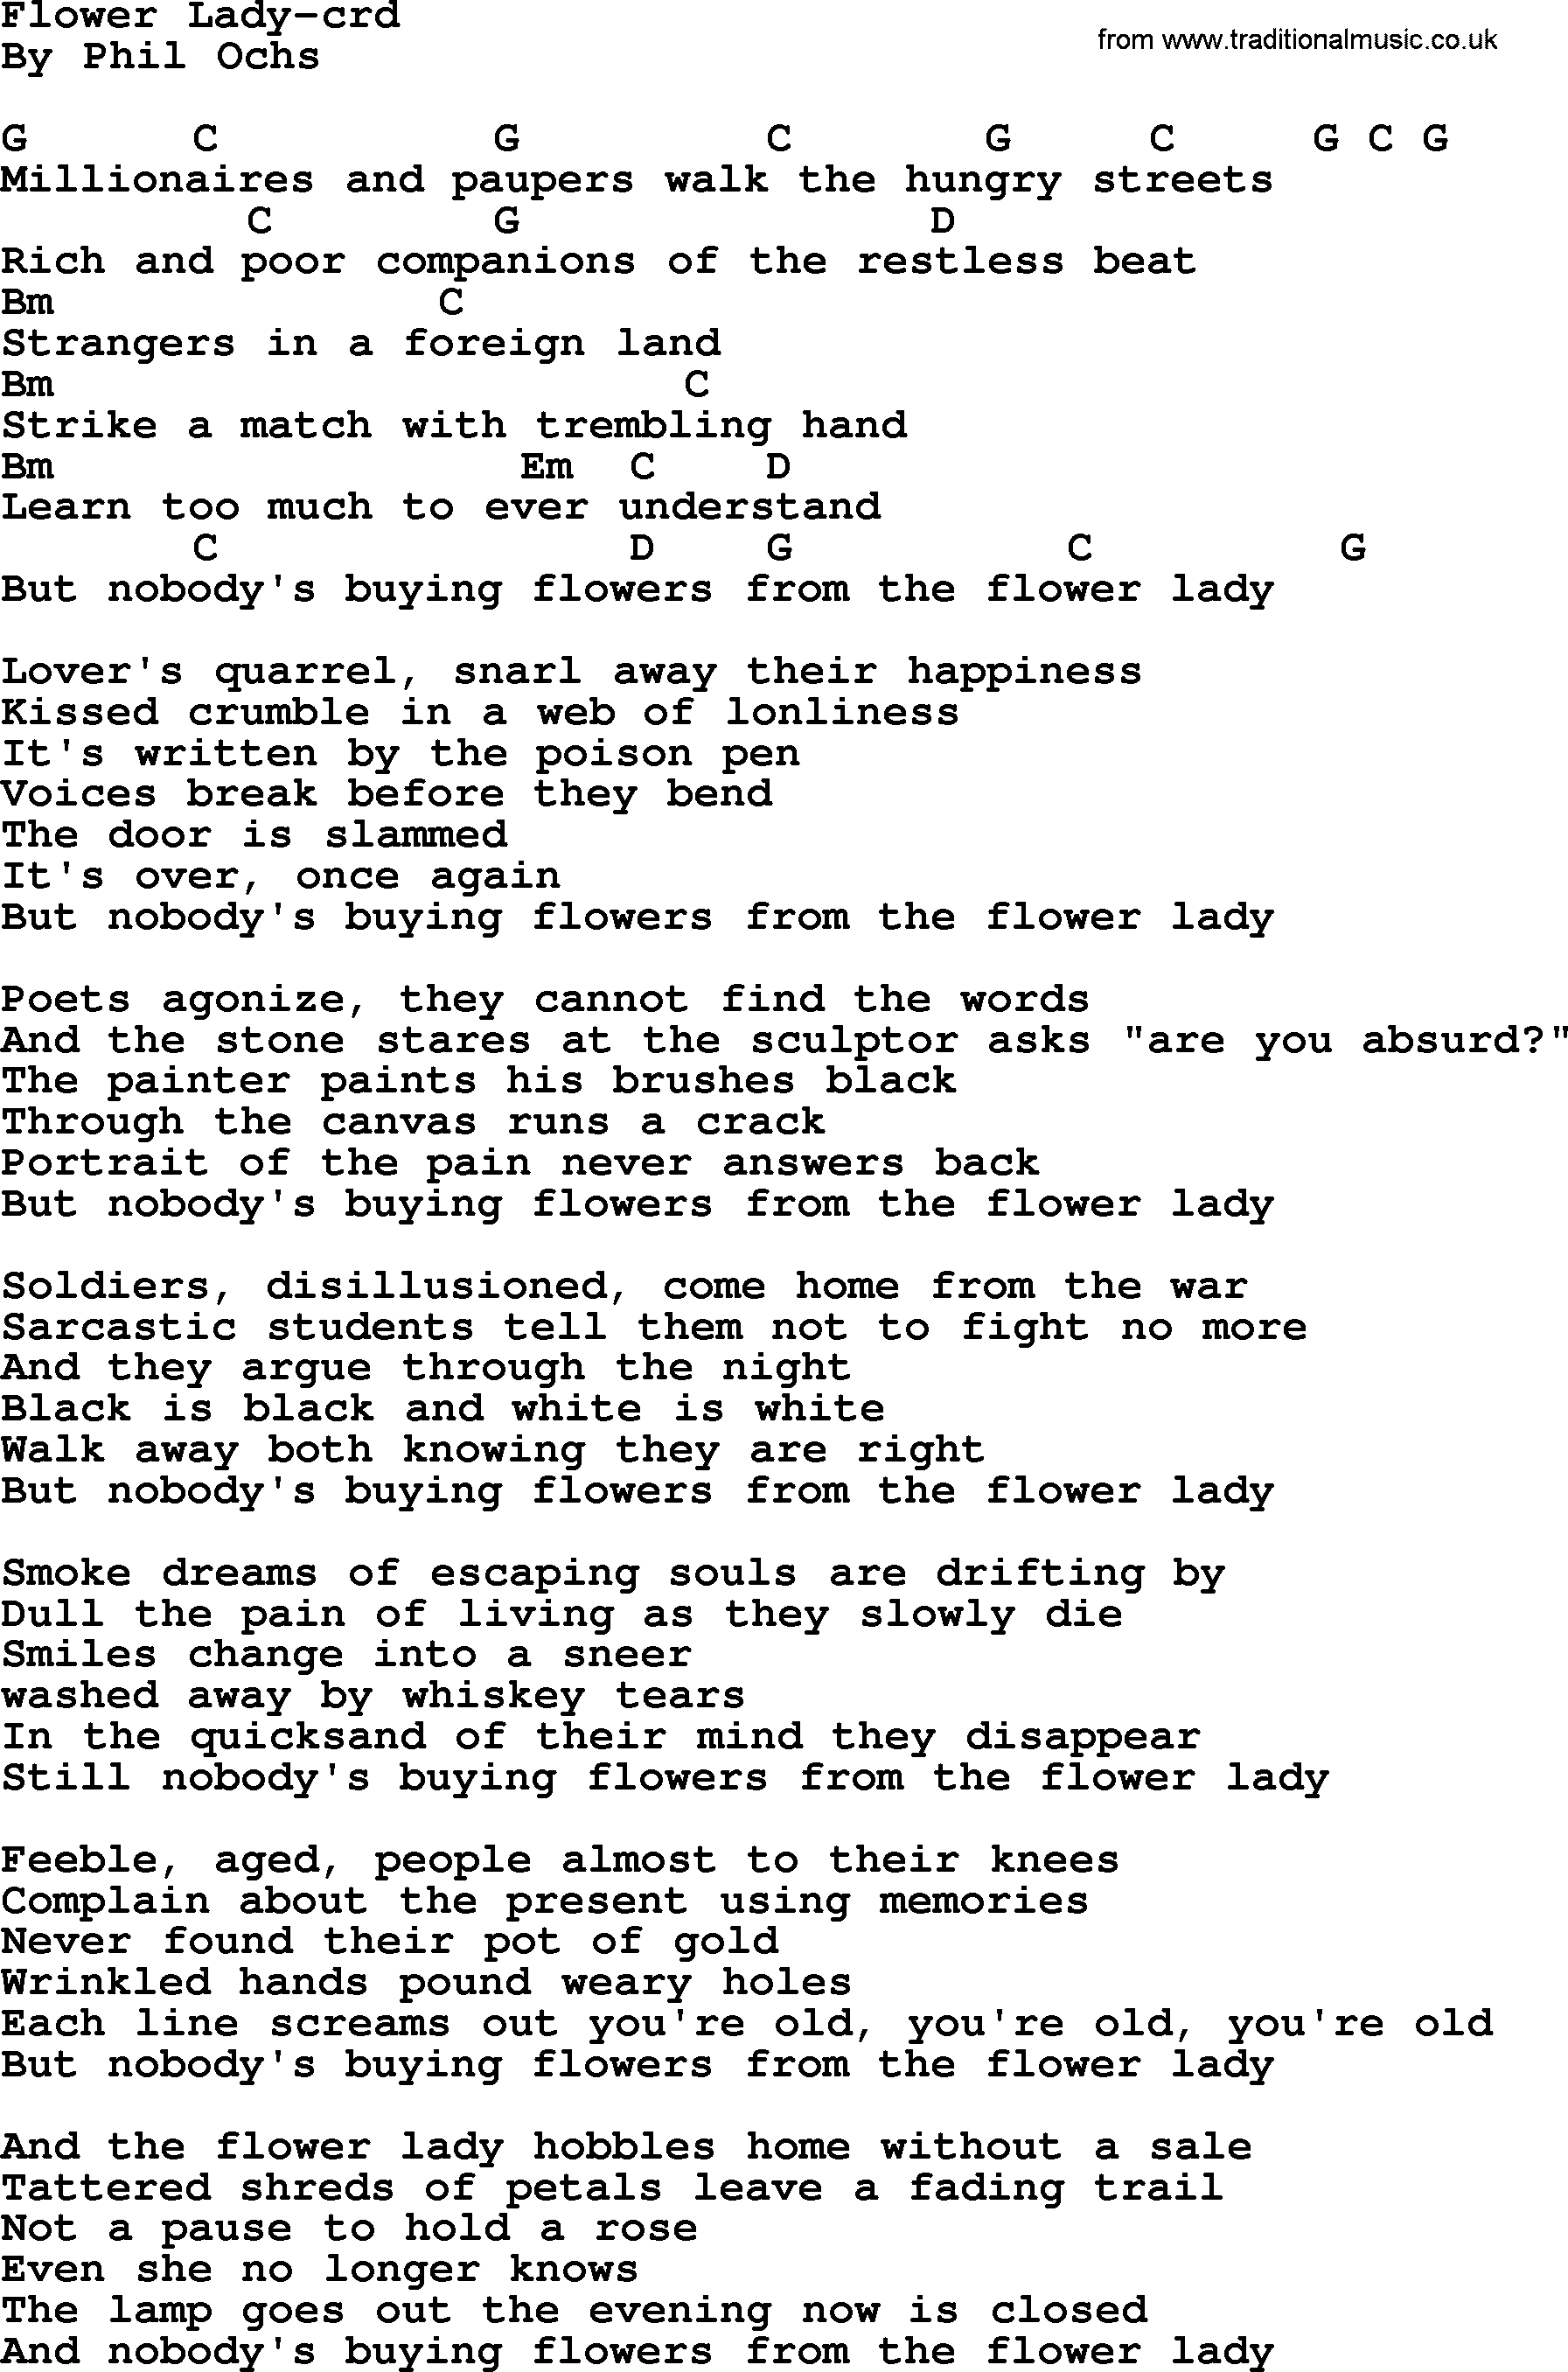 Phil Ochs Song Flower Lady By Phil Ochs Lyrics And Chords Phil